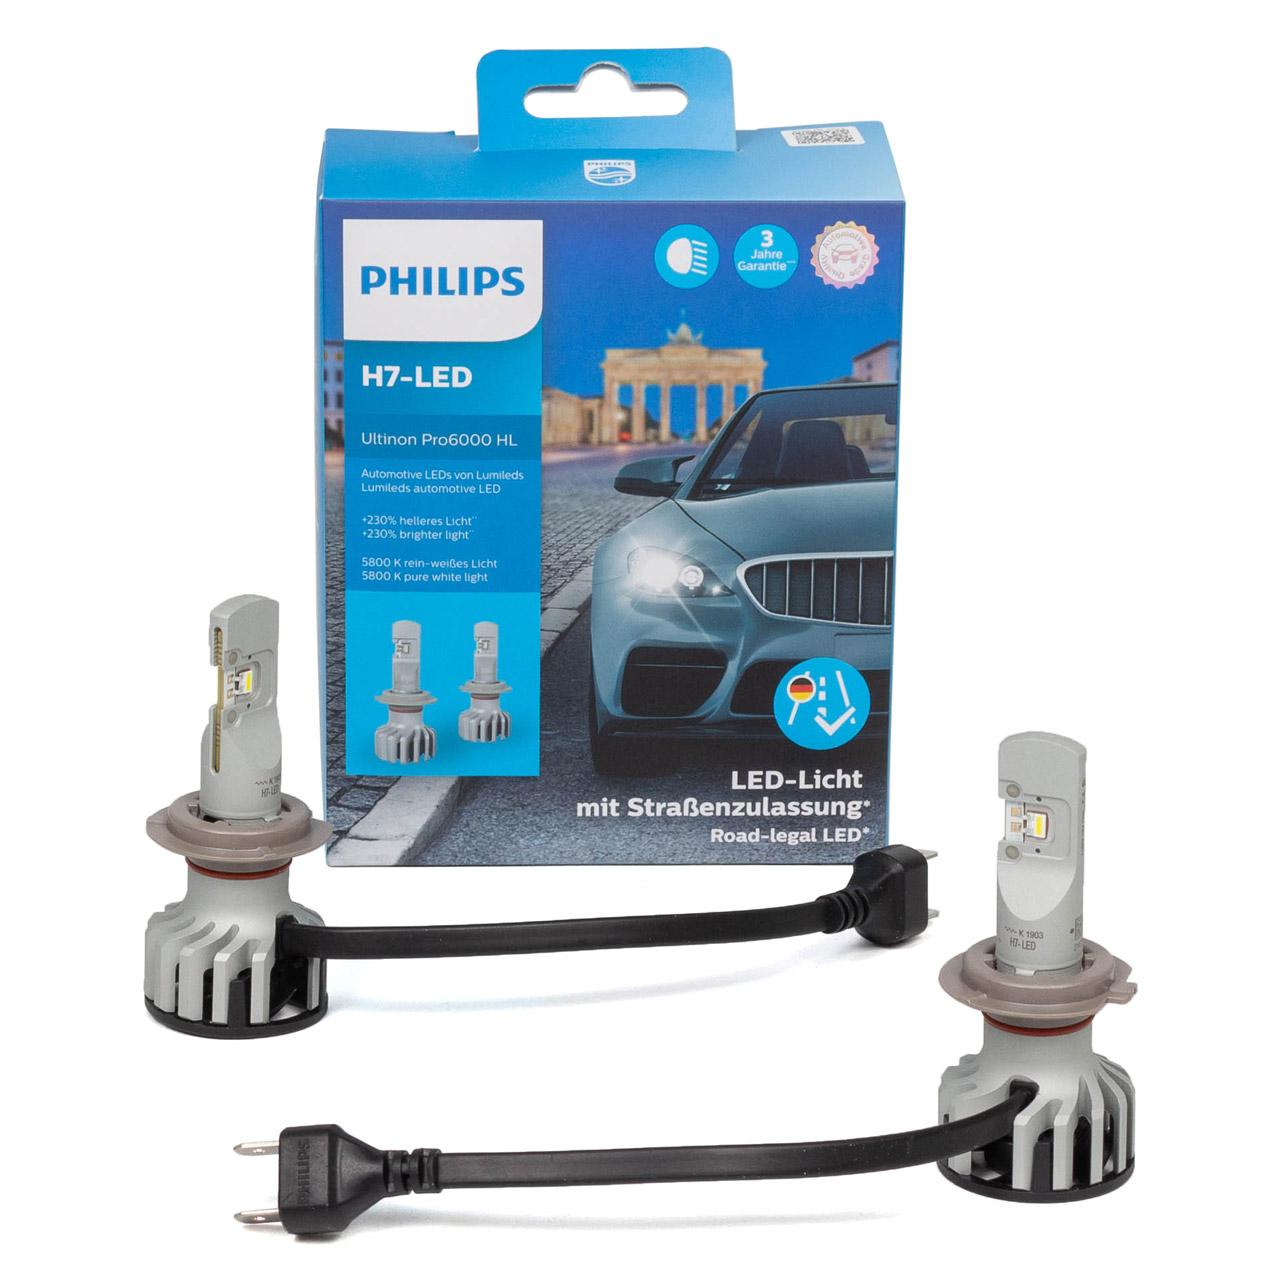 2x PHILIPS Ultinon Pro6000 H7 LED Lampe 11972X2 mit Straßenzulassung 12V +230% 5.800K